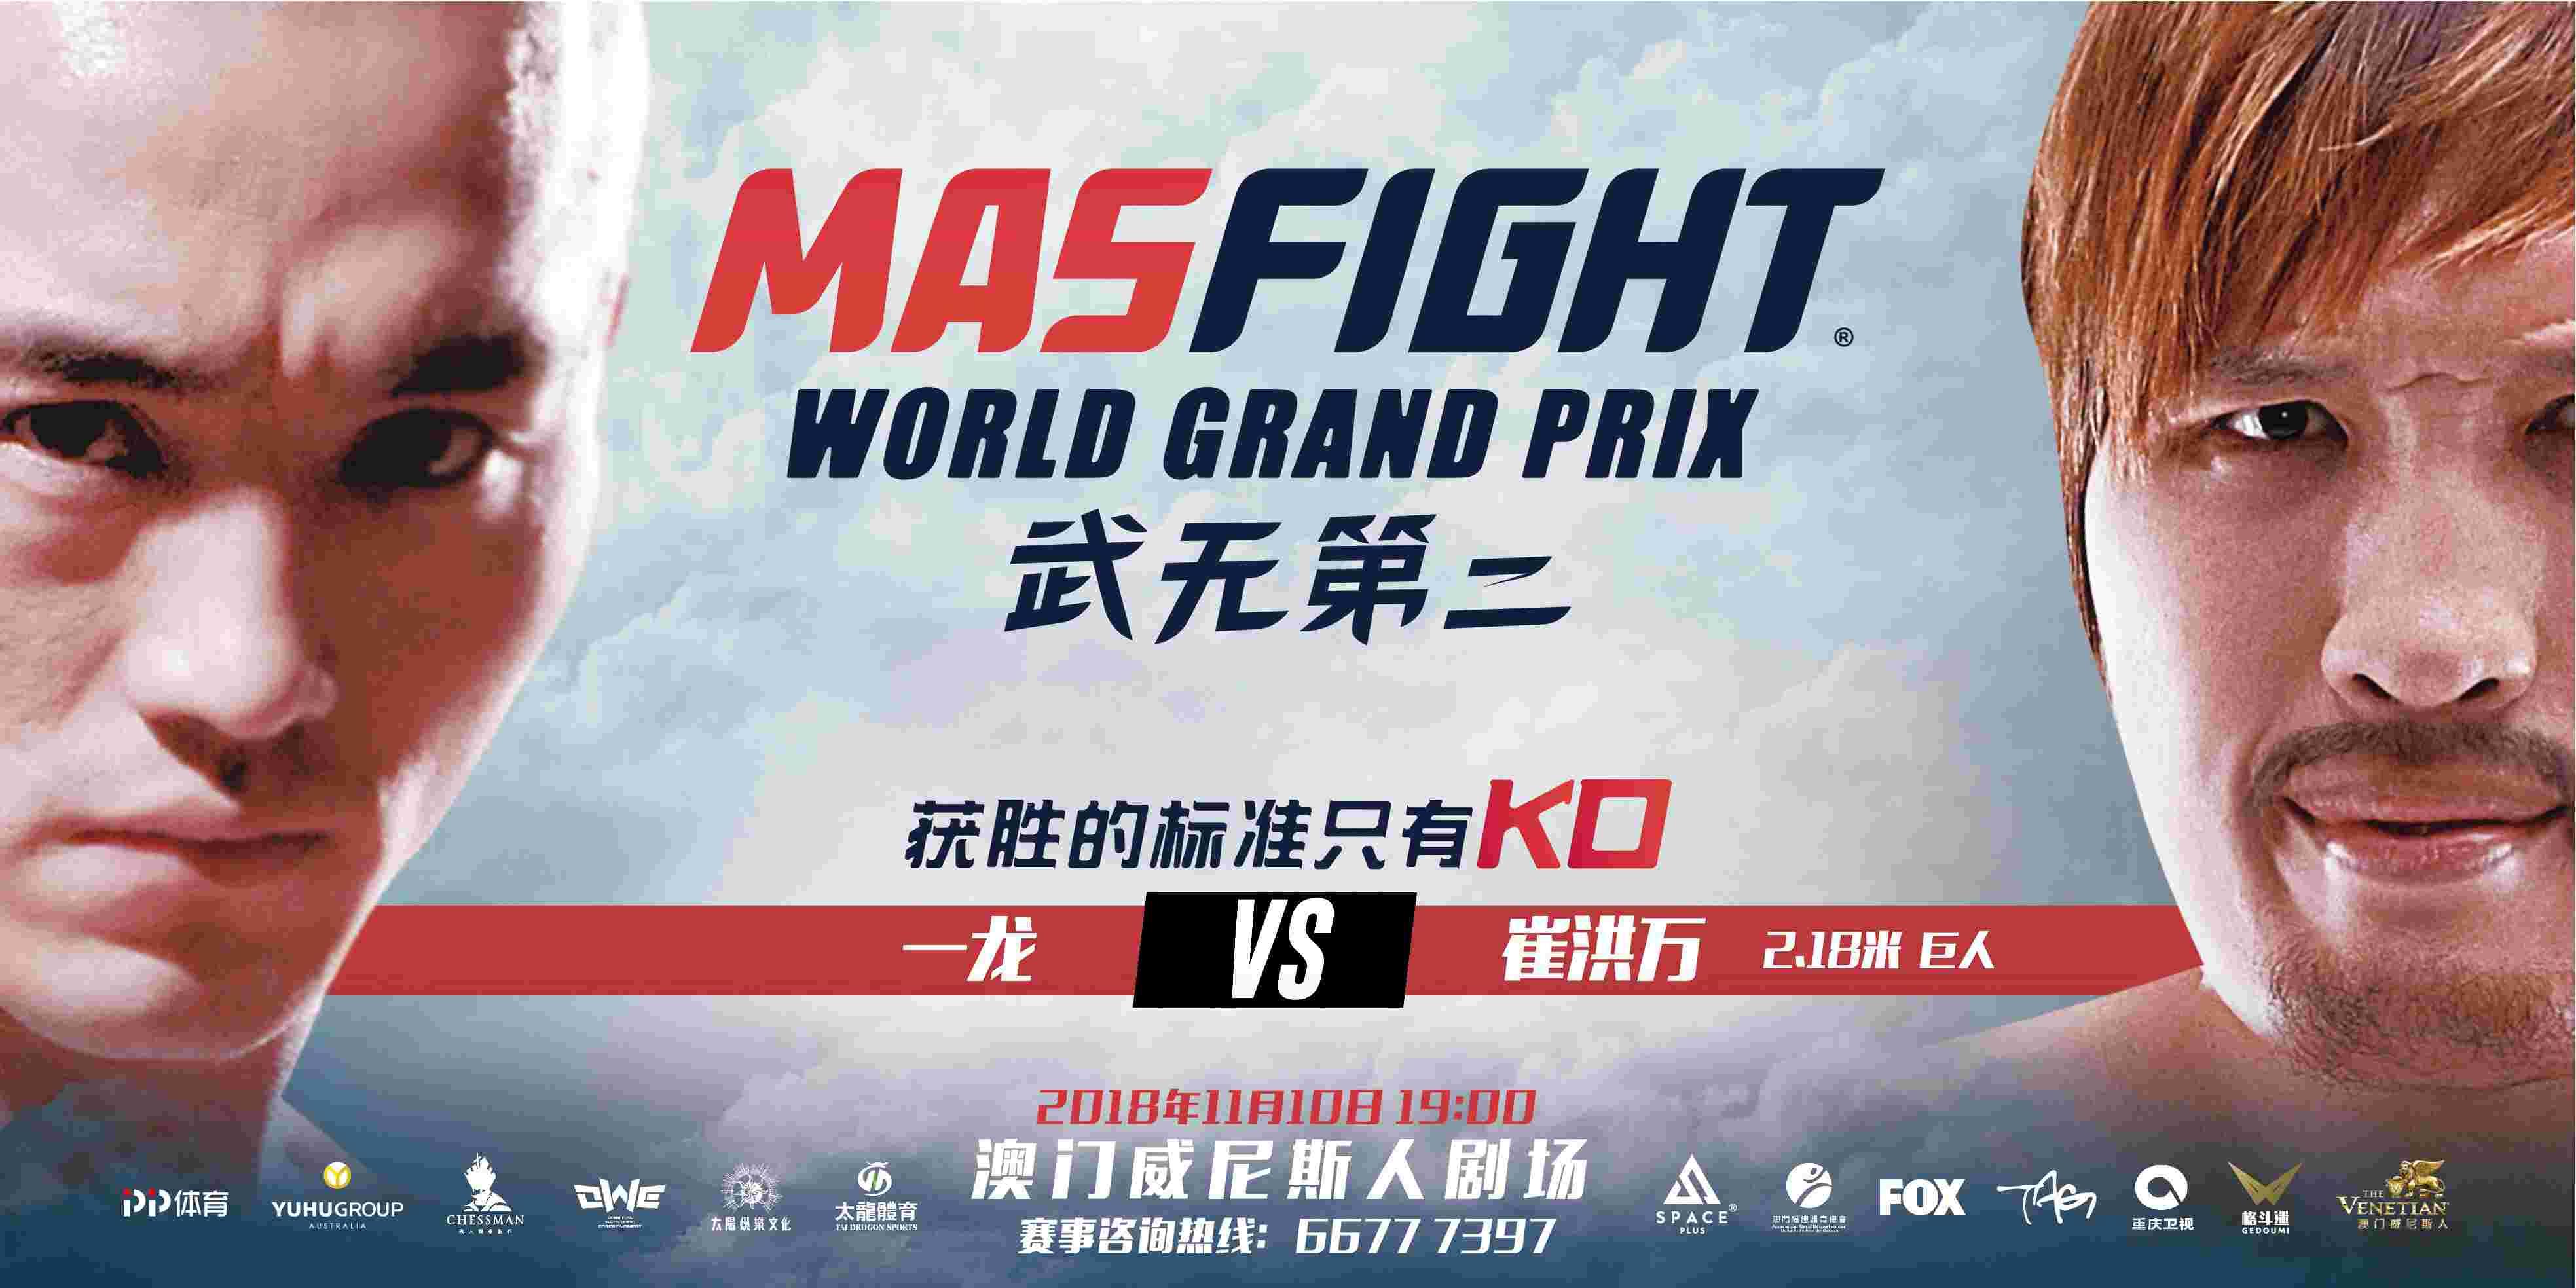 MASFIGHT搏击大赛发布会 (1).jpg